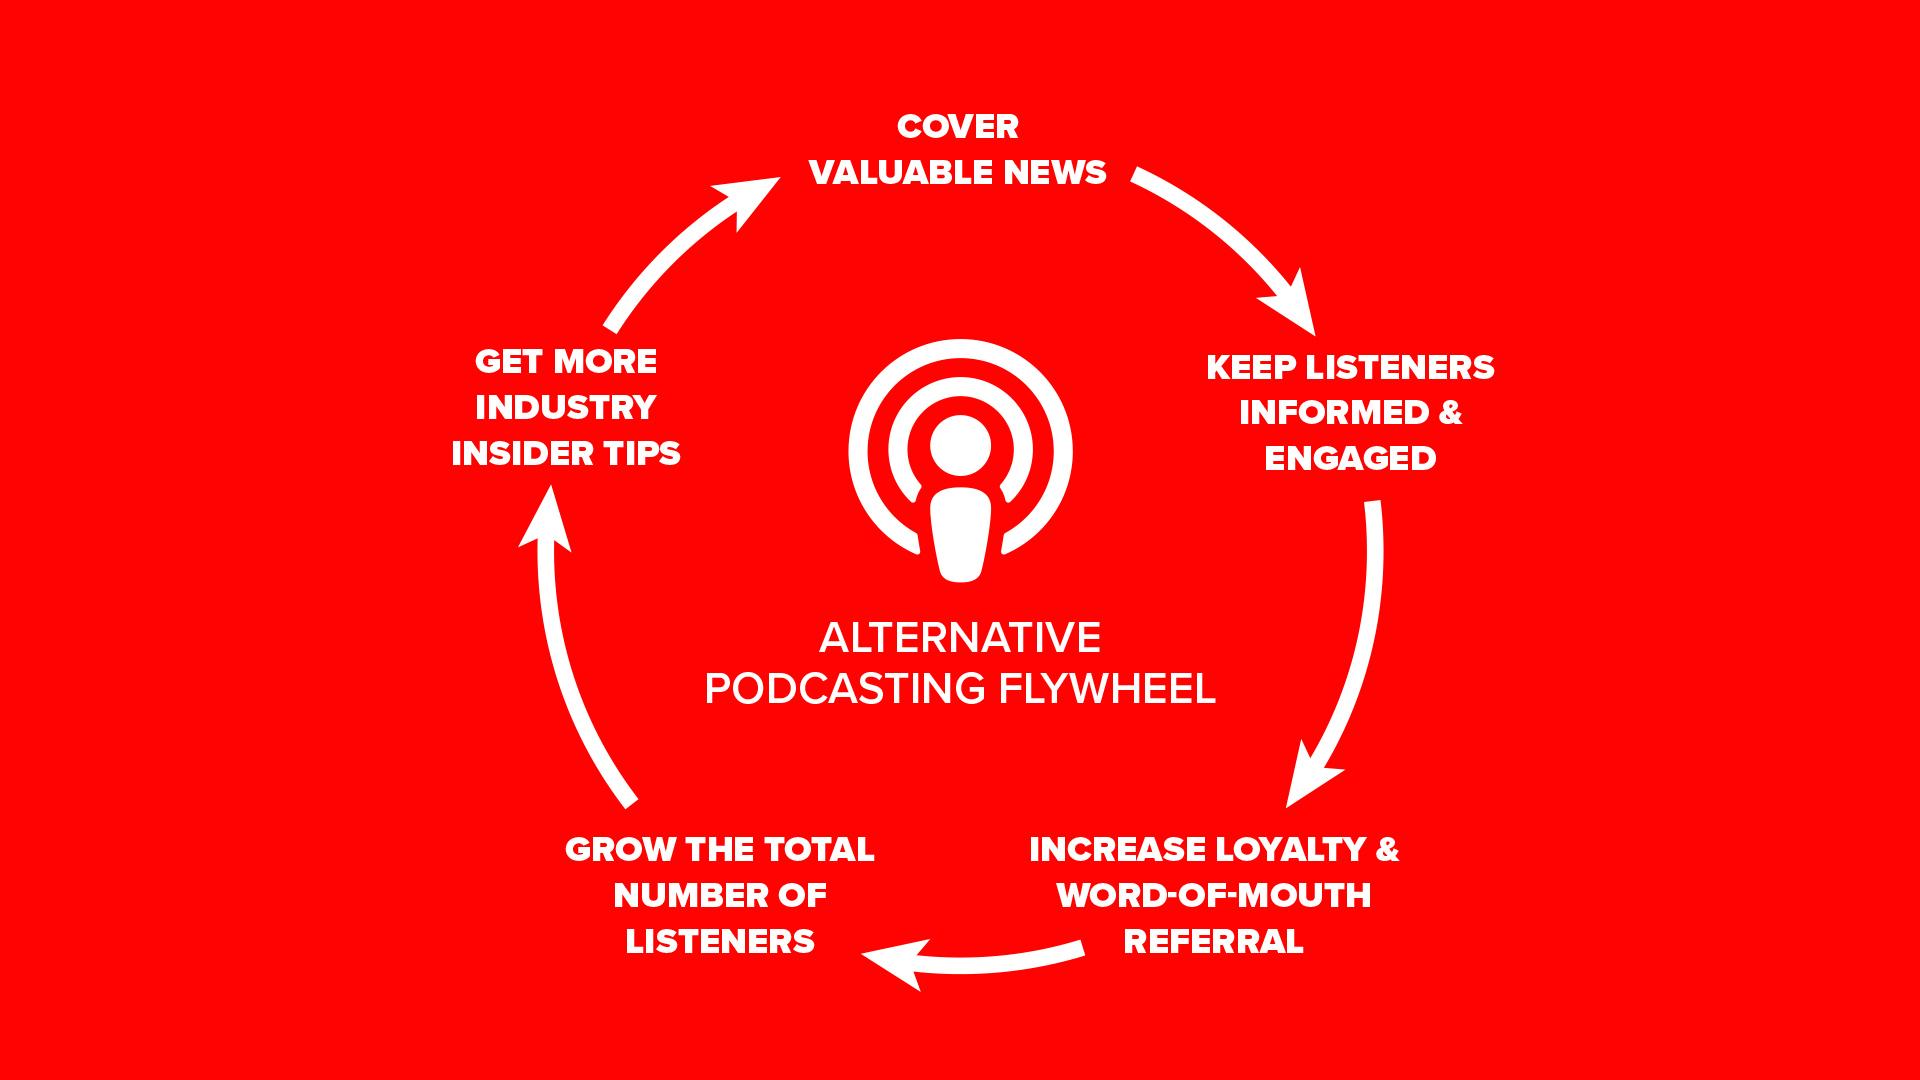 Alternative Podcasting Flywheel Infographic